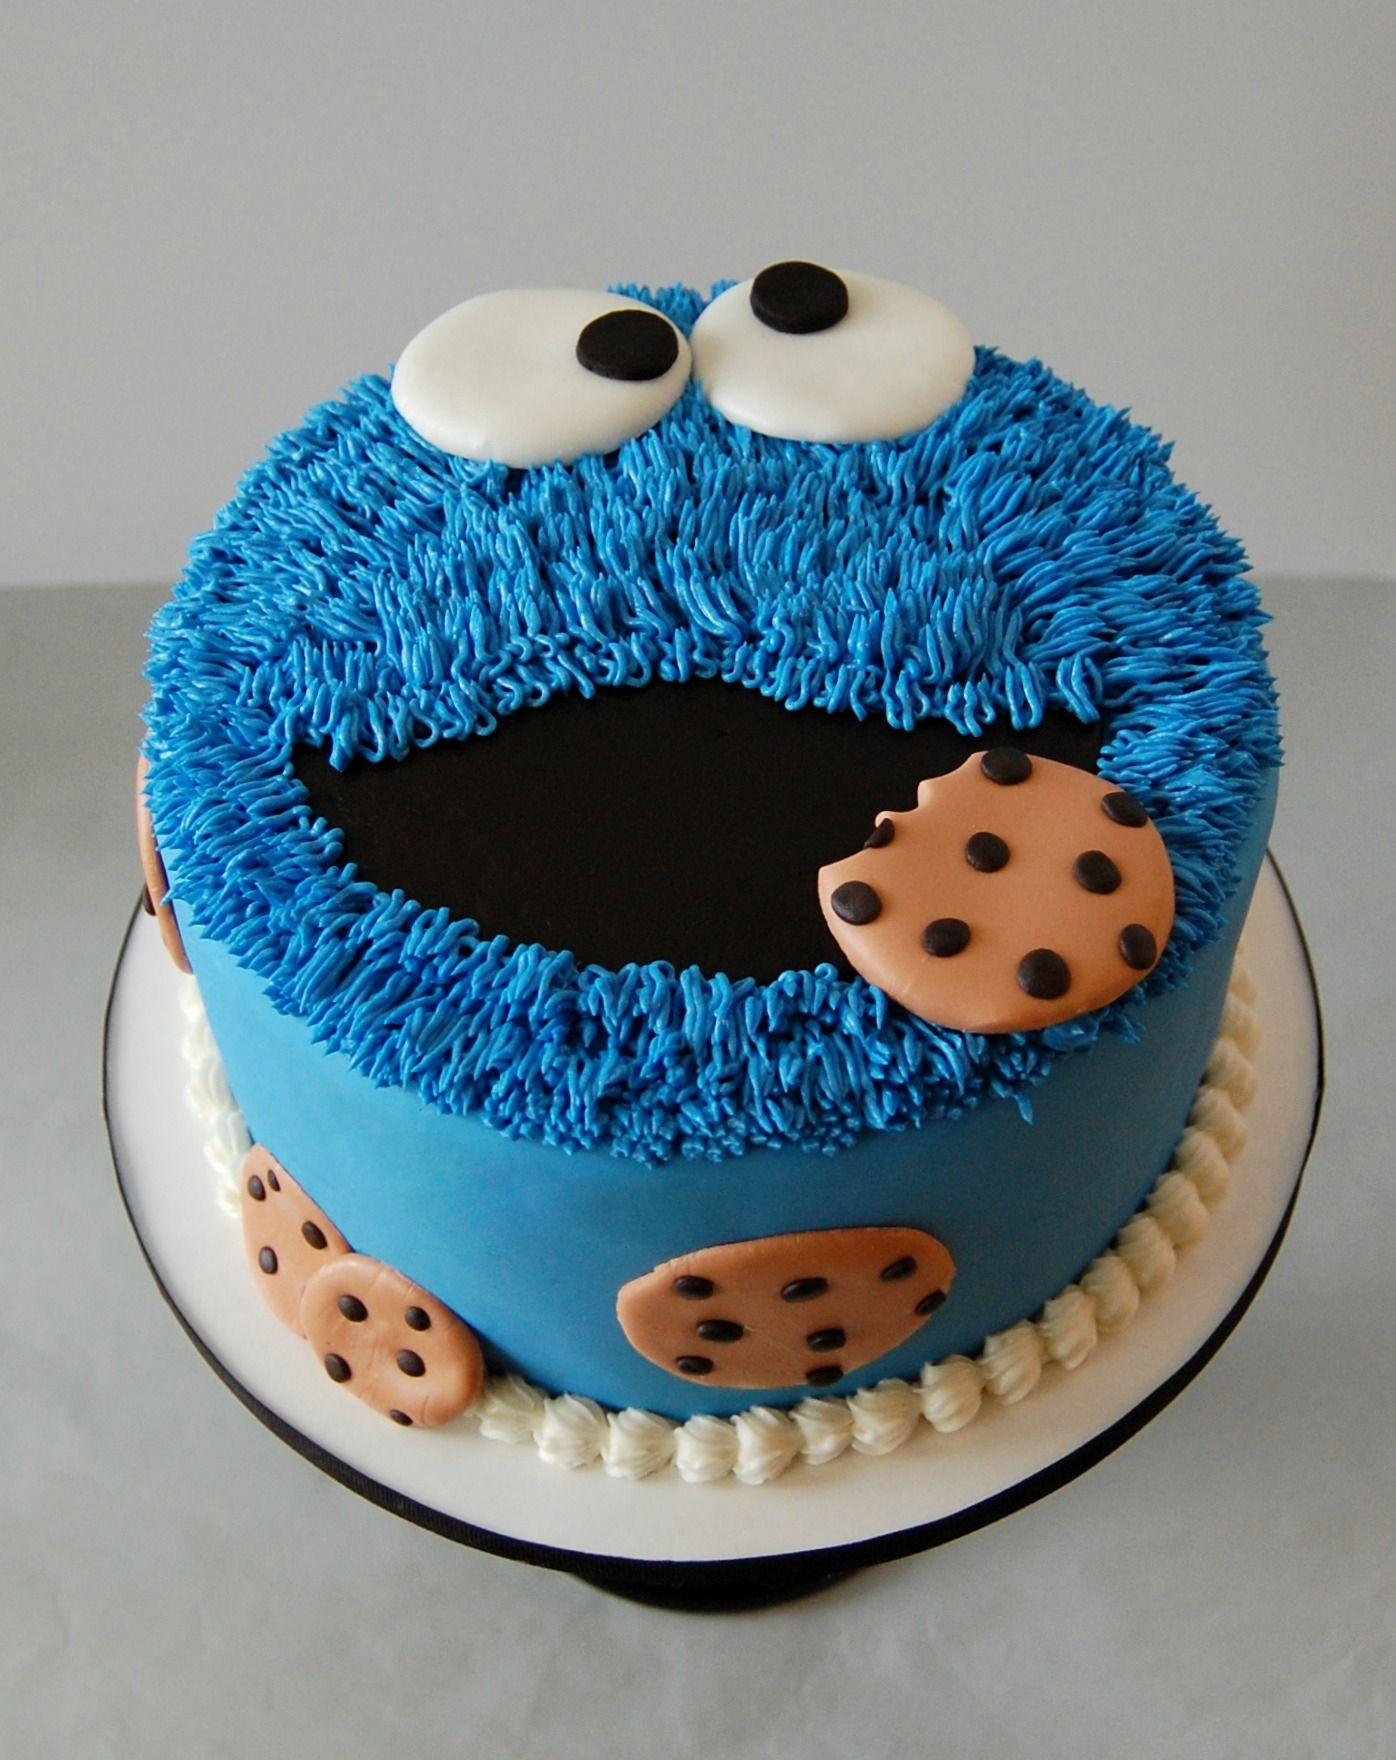 Cookie Monster Cake Monster Birthday Cakes Cookie Monster Cake Cookie Monster Cakes